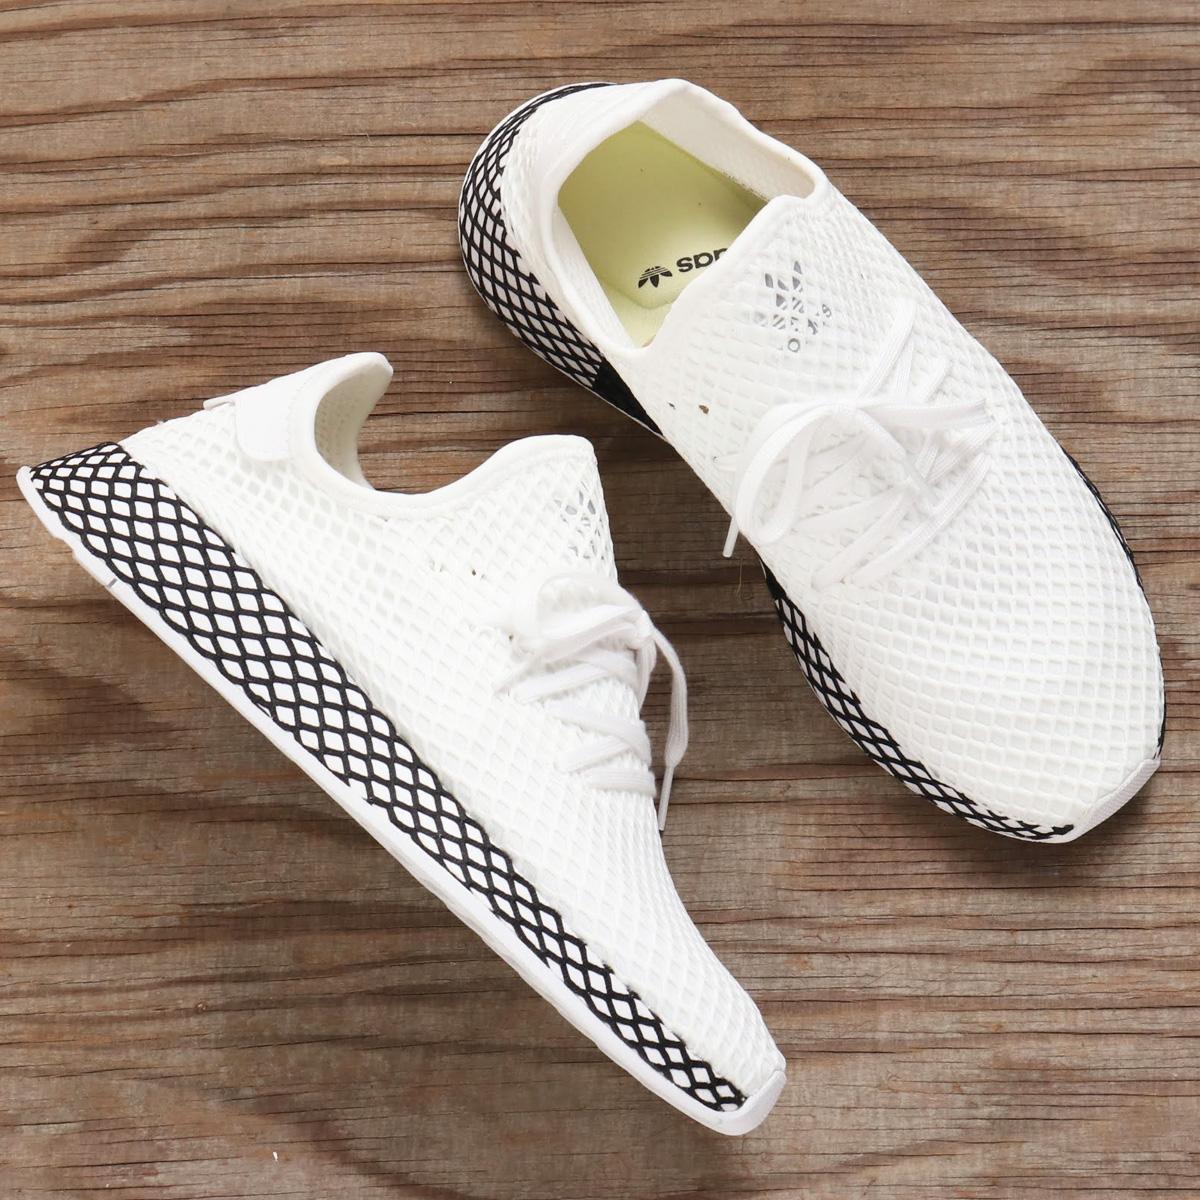 64ef81113 adidas Originals DEERUPT RUNNER(アディダス オリジナルス WHITE RUNNING WHITE CORE BLACK メンズ  スニーカー 18FW-I ディラプトランナー)RUNNING-スニーカー